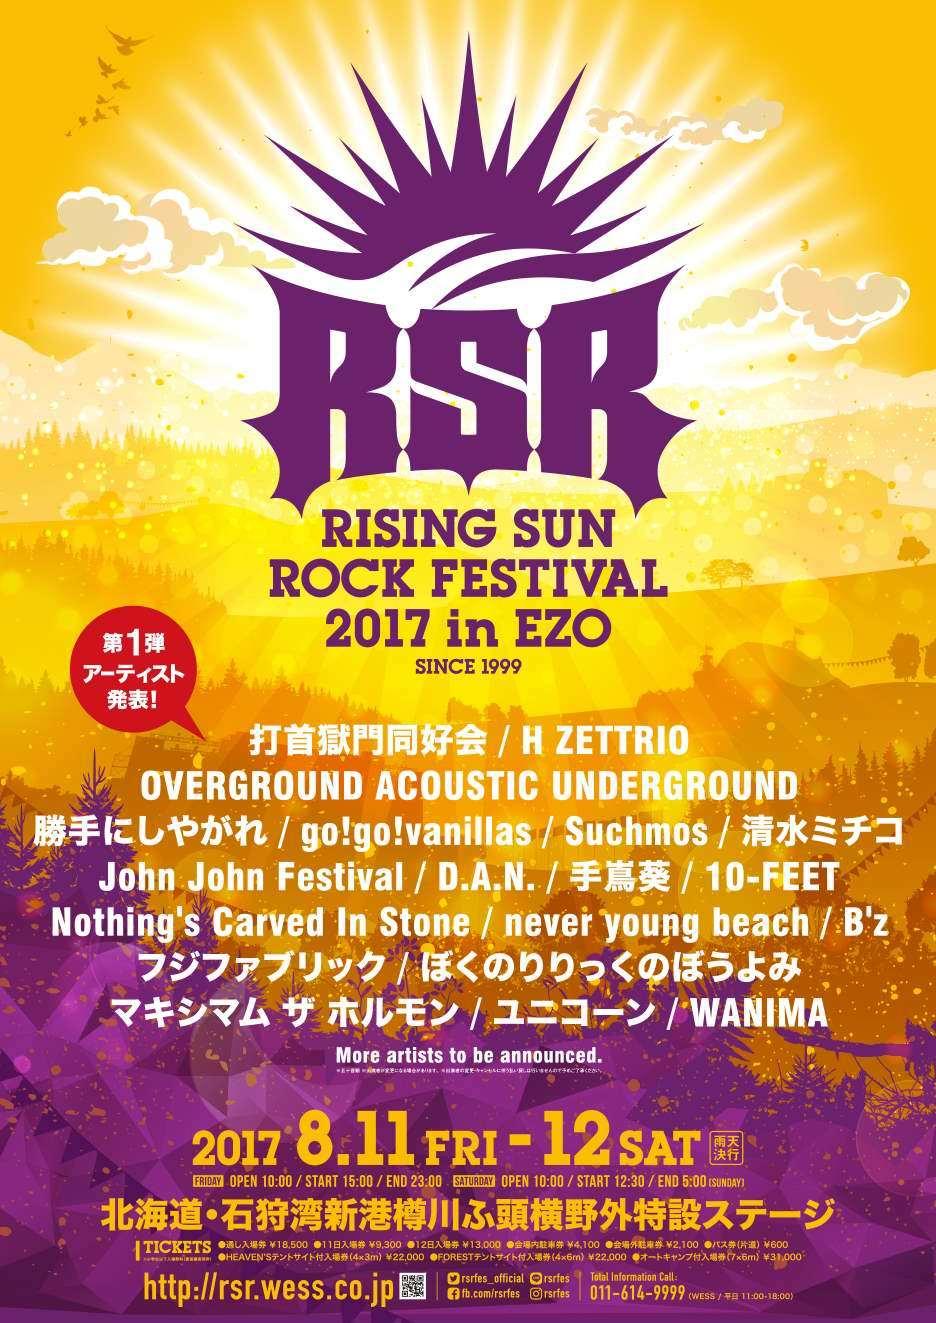 RISING SUN ROCK FESTIVAL 2017 in EZO